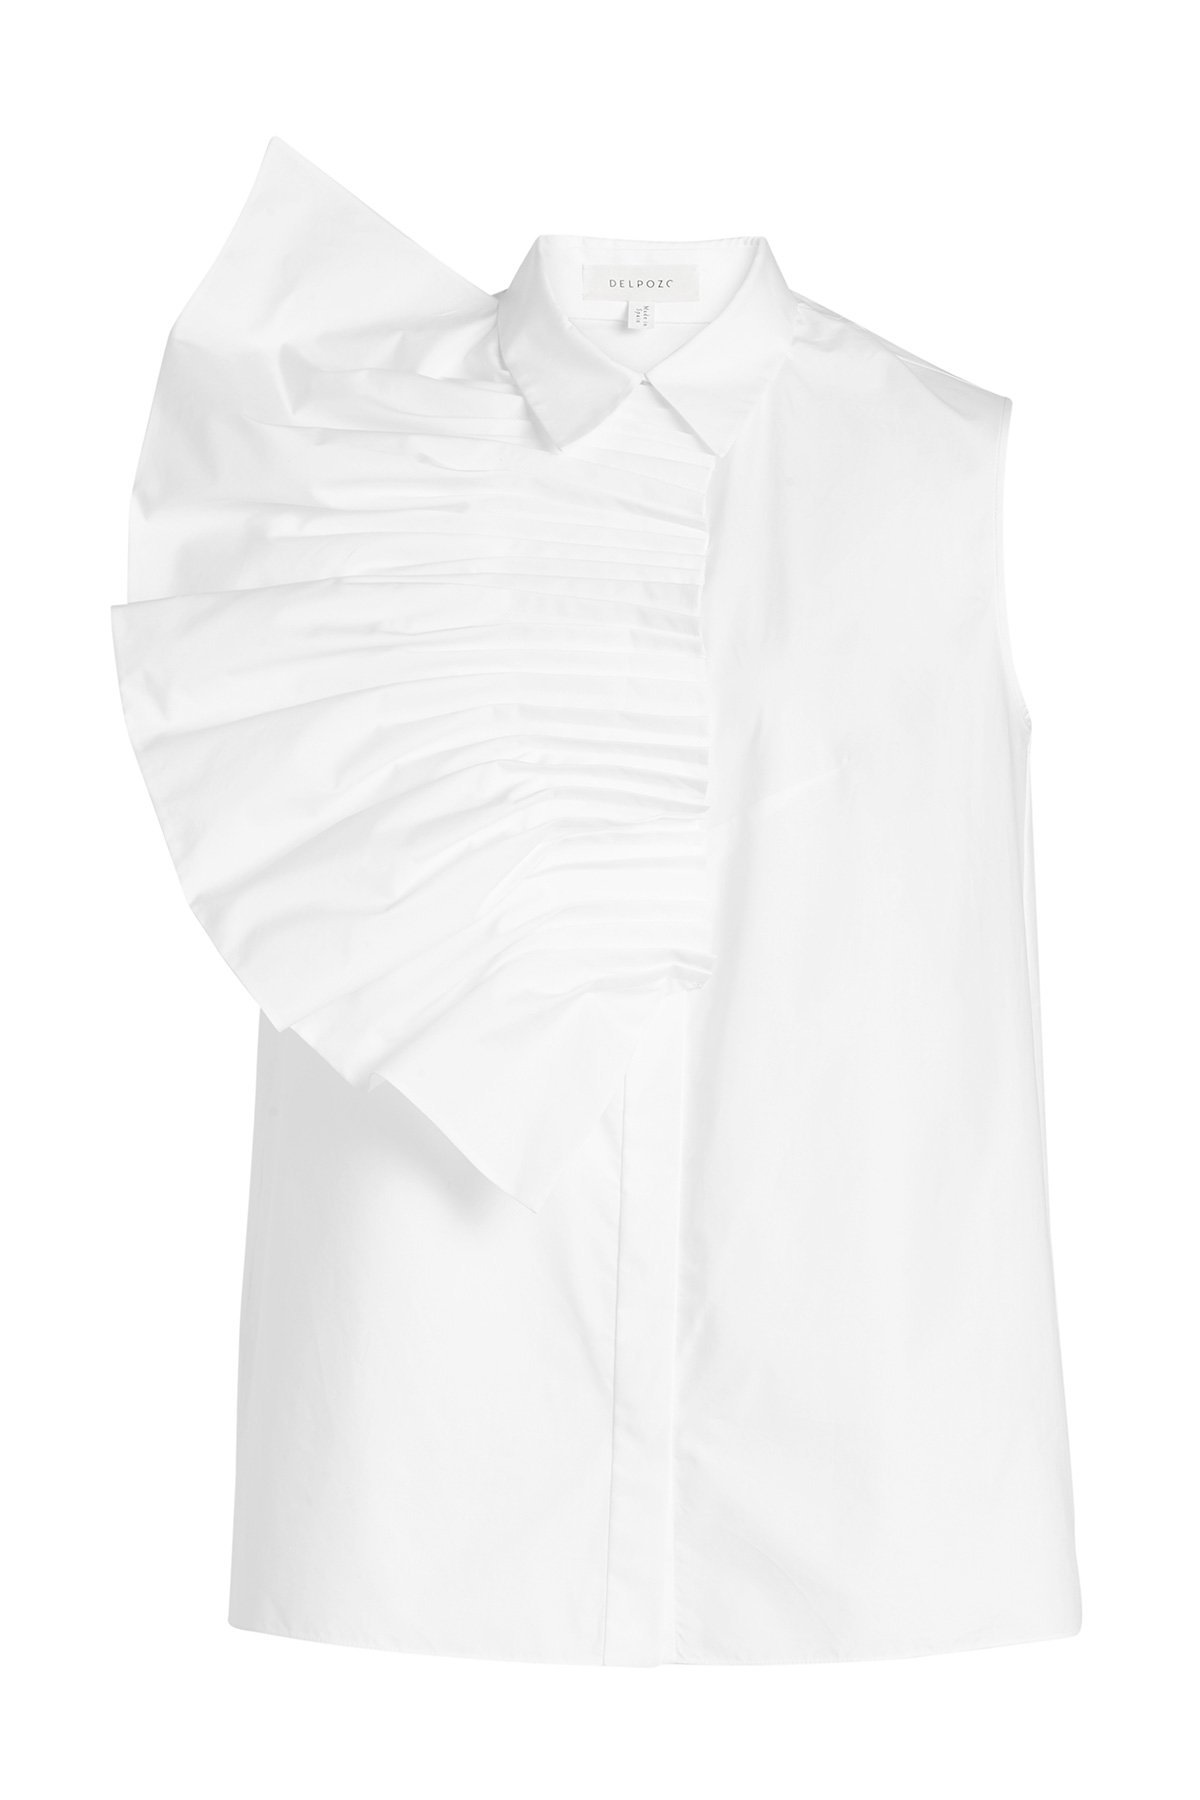 Pin Tuck Fan Sleveless Cotton Shirt Gr. FR 38